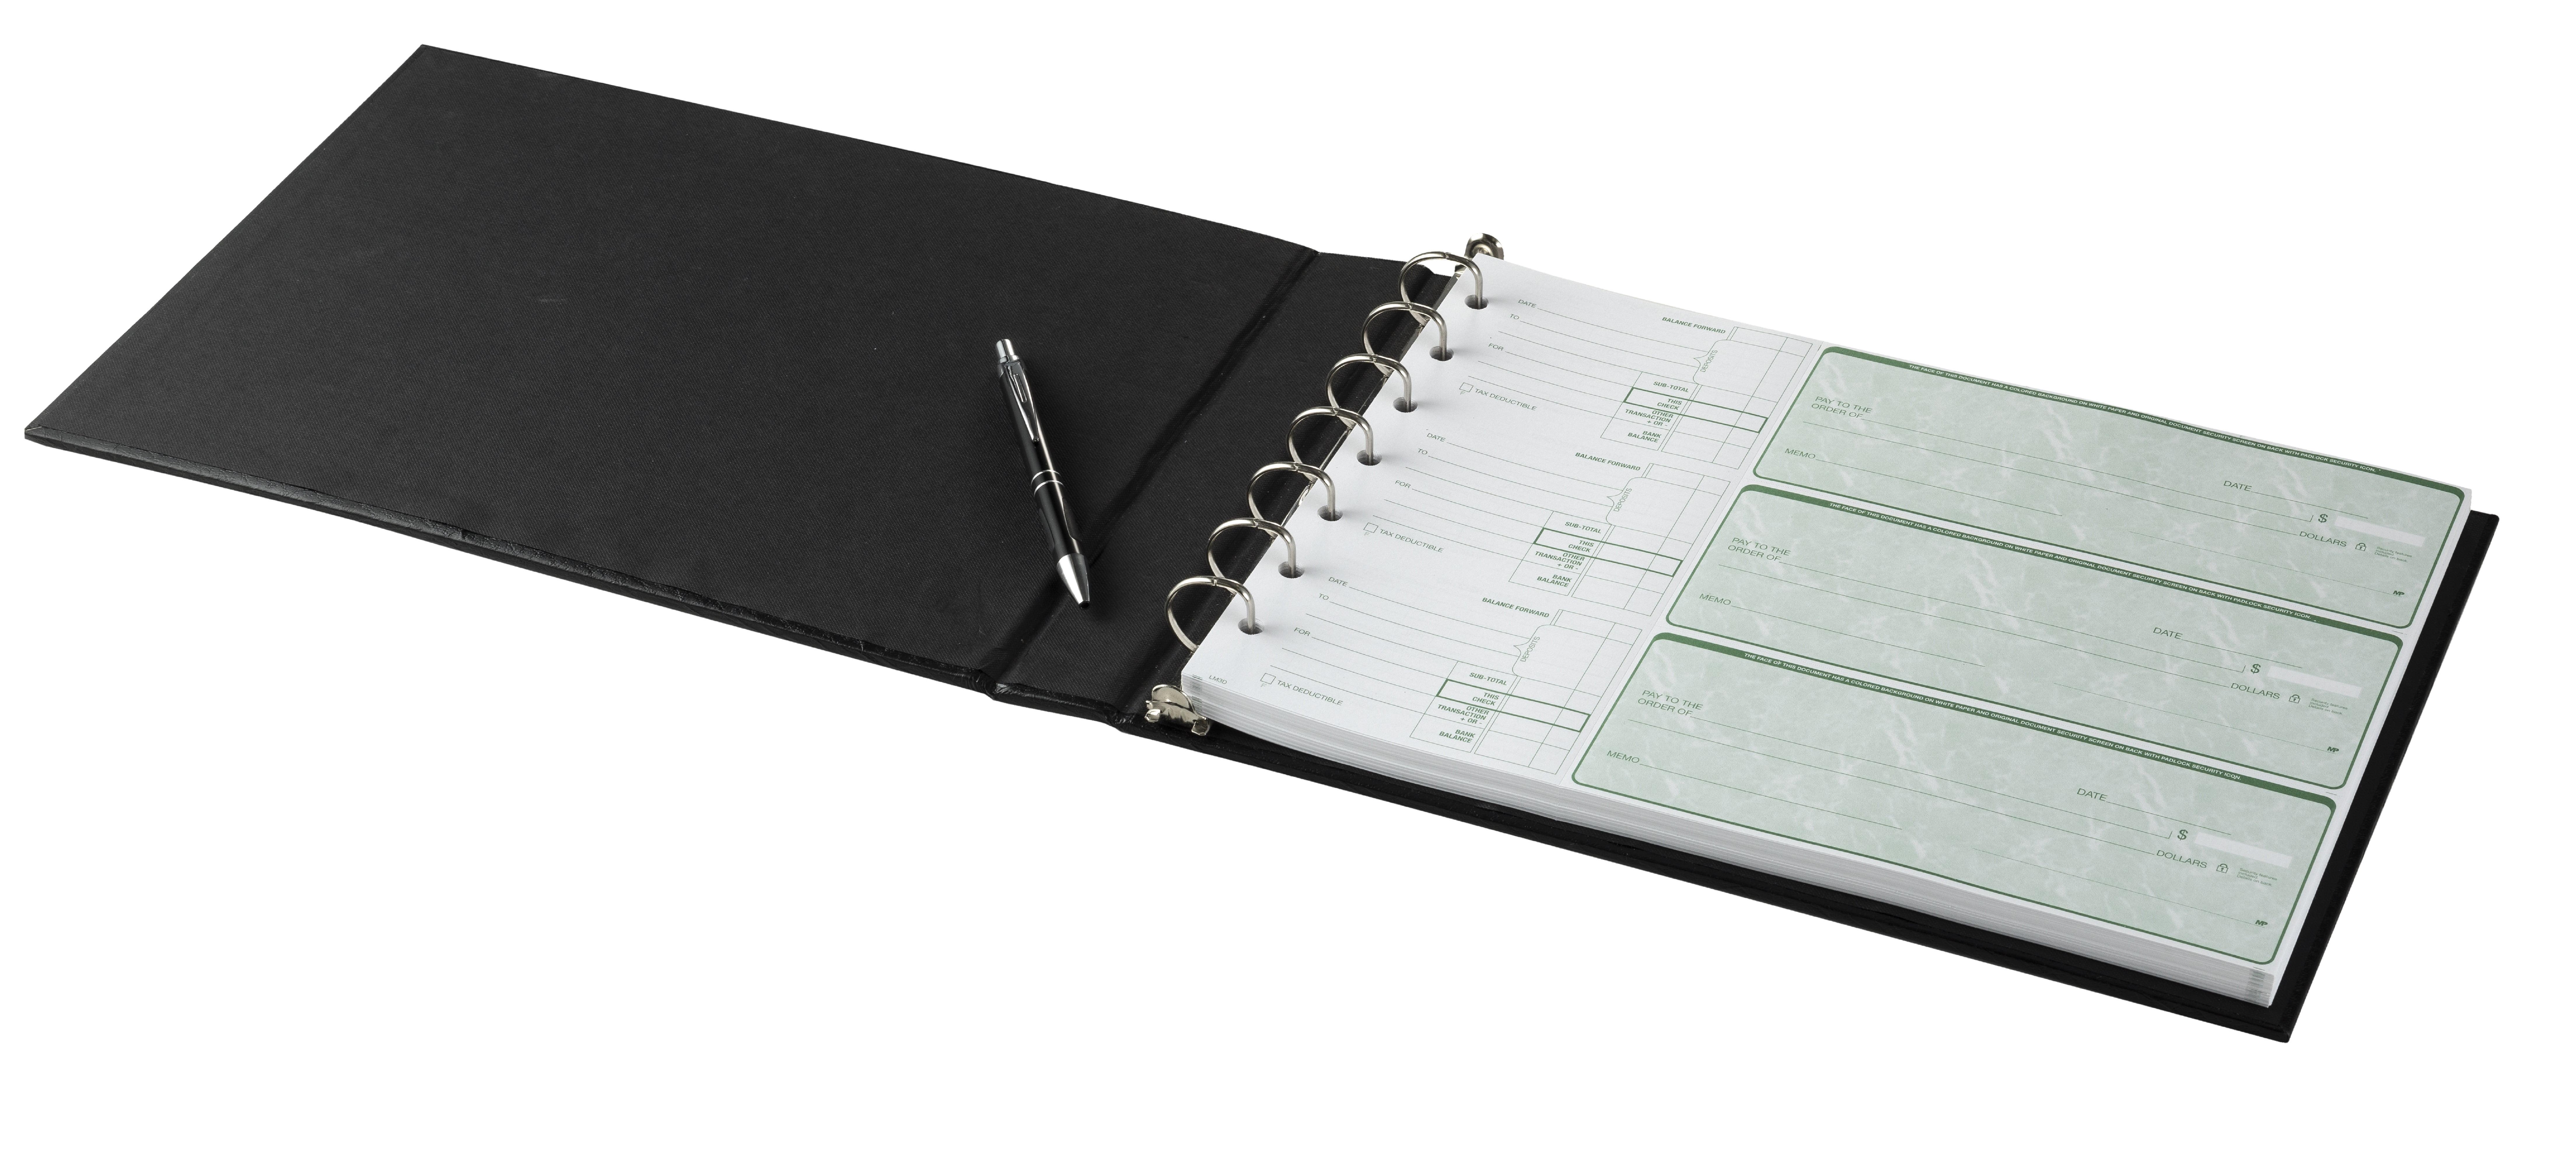 Executive 7 Ring Check Binder For 9x13 Inch Sheets Sleek Design 11703